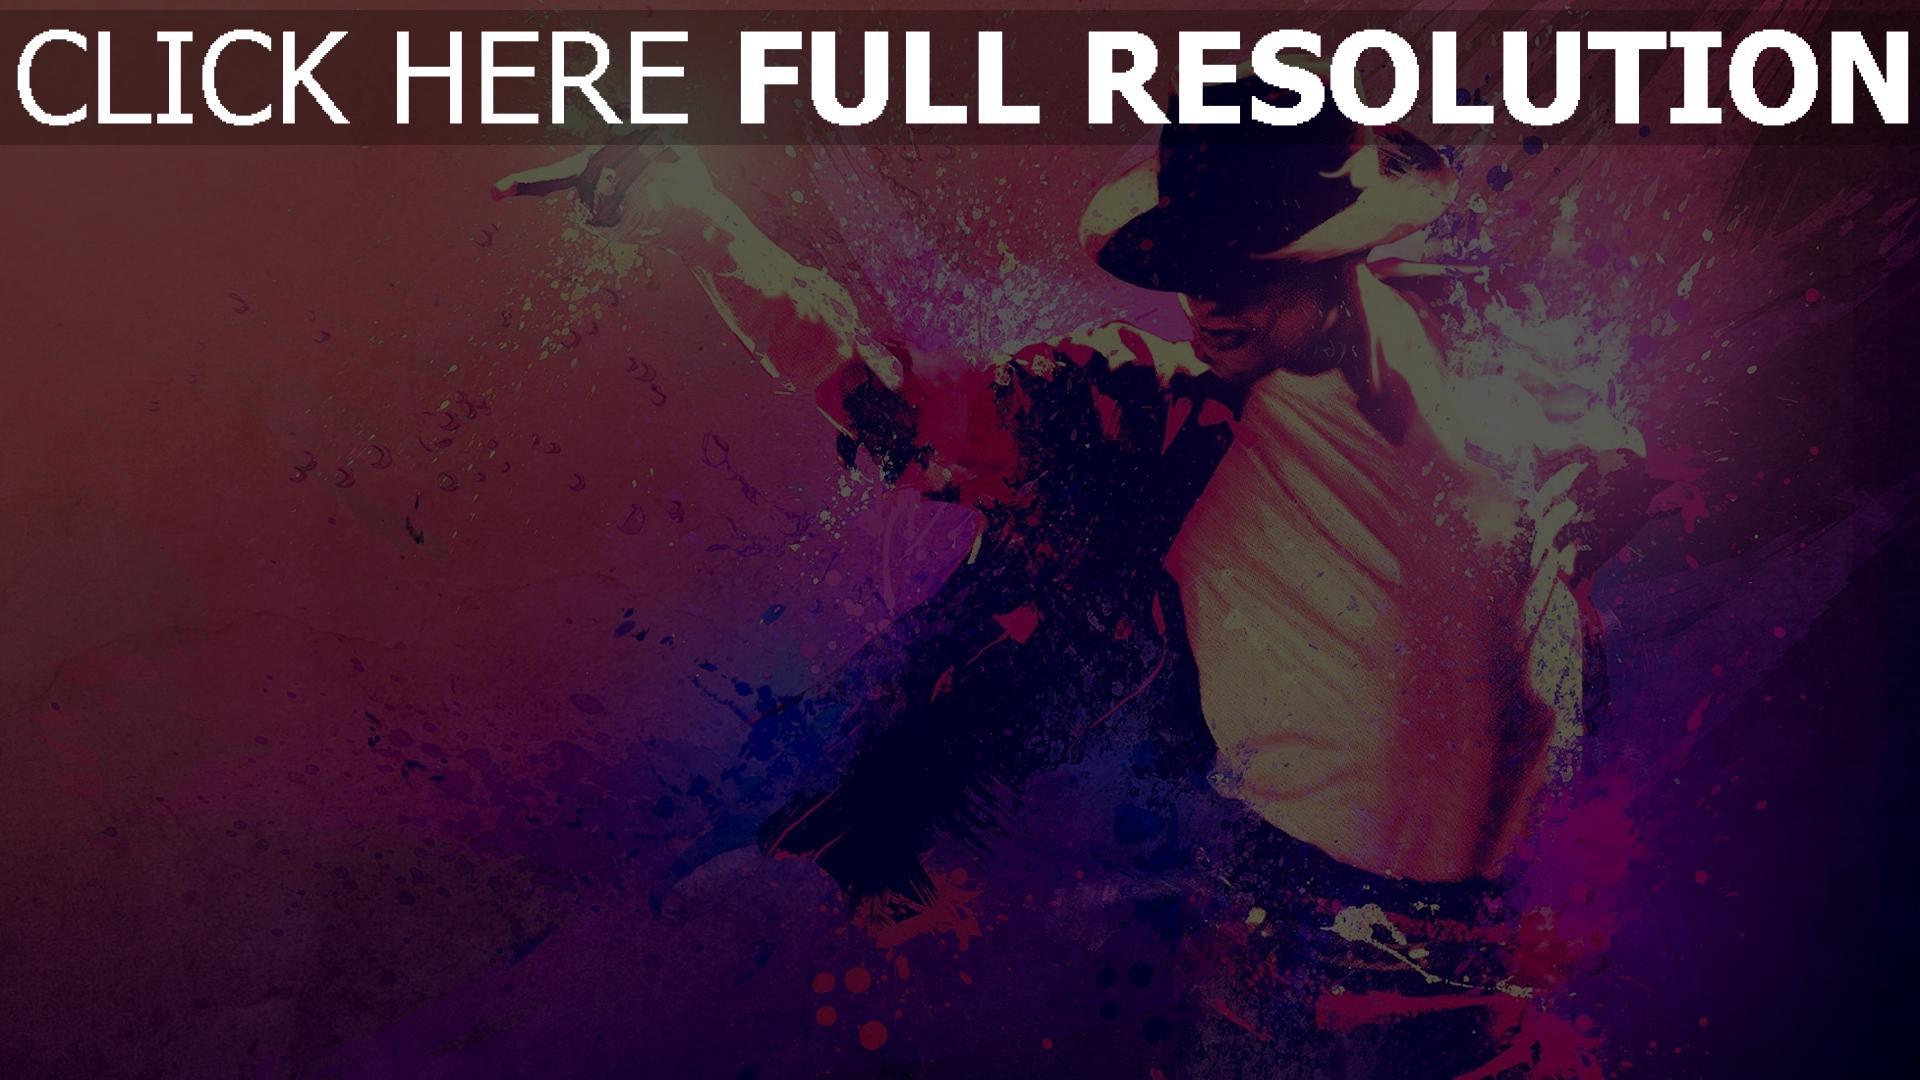 hd hintergrundbilder anzug michael jackson tanz hut farben 1920x1080